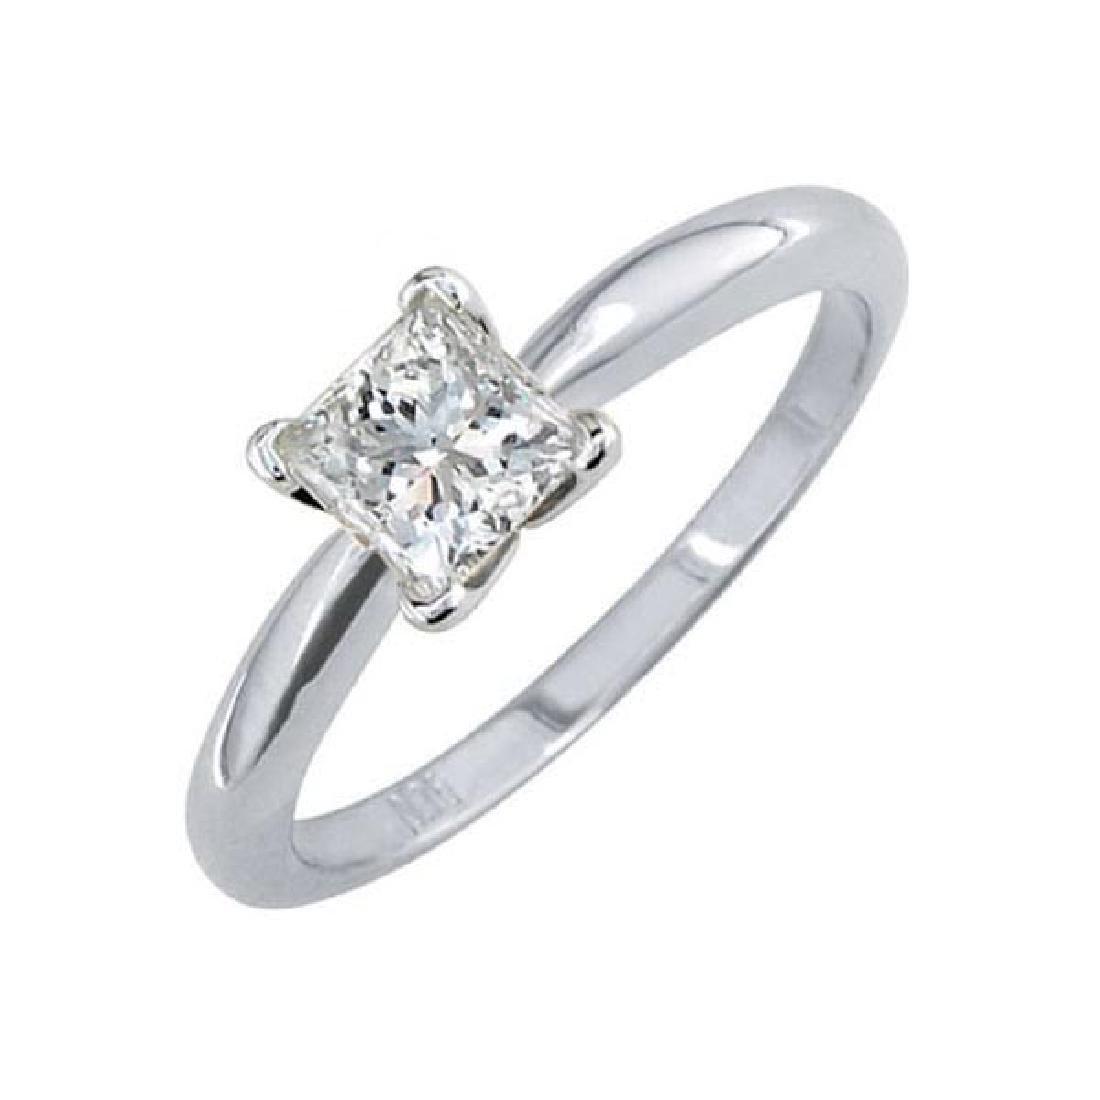 Certified 1.16 CTW Princess Diamond Solitaire 14k Ring